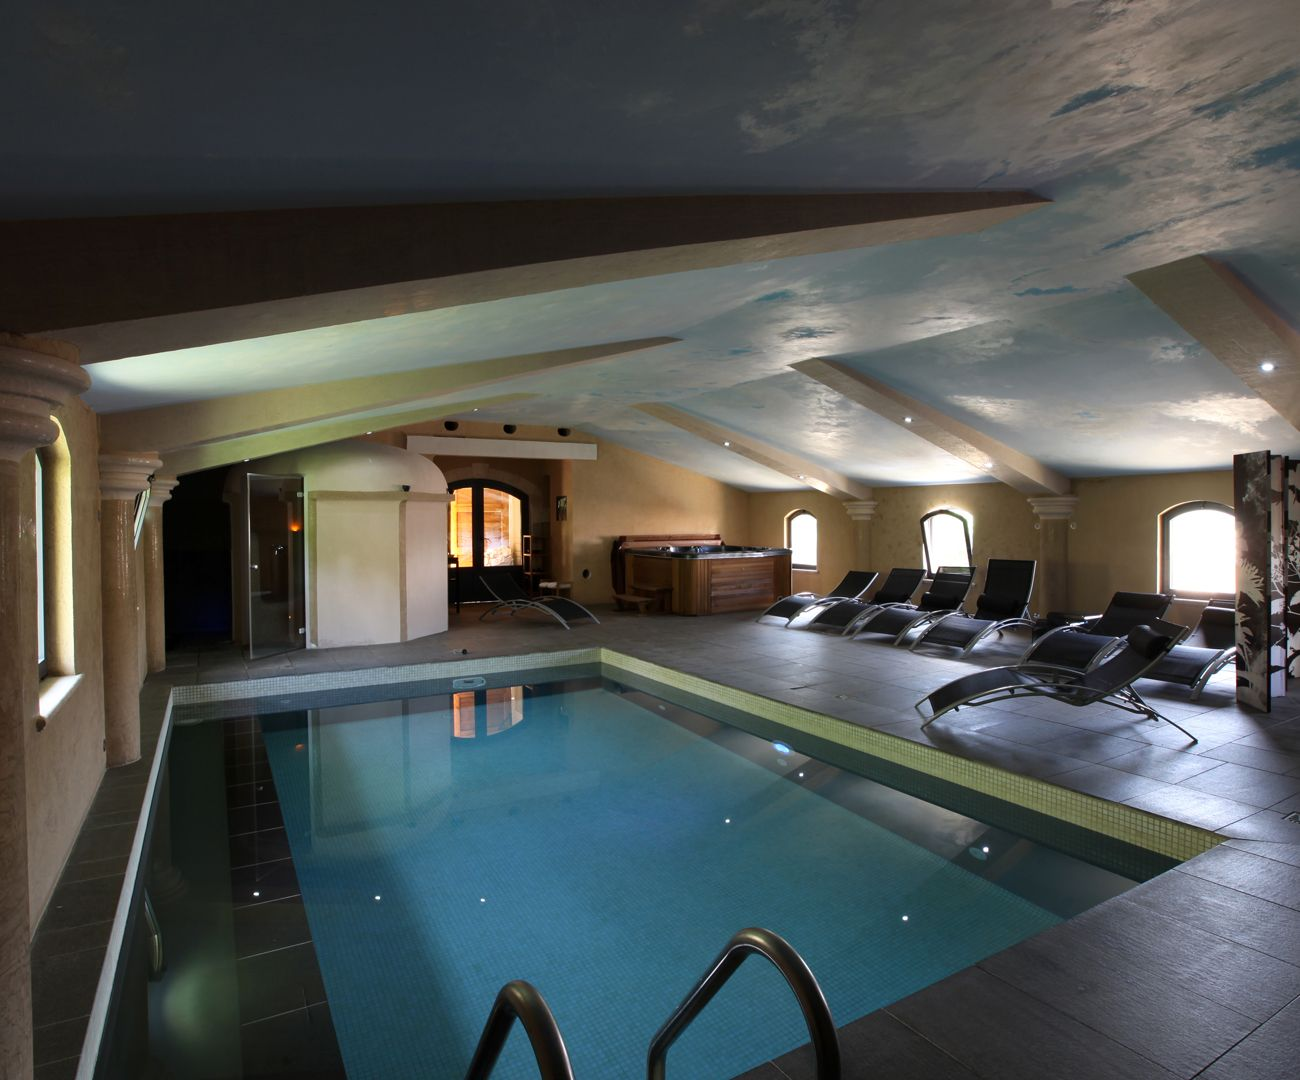 chambre d hote spa drome la demeure du mokuso spajacuzzi with chambre d hote spa drome awesome. Black Bedroom Furniture Sets. Home Design Ideas